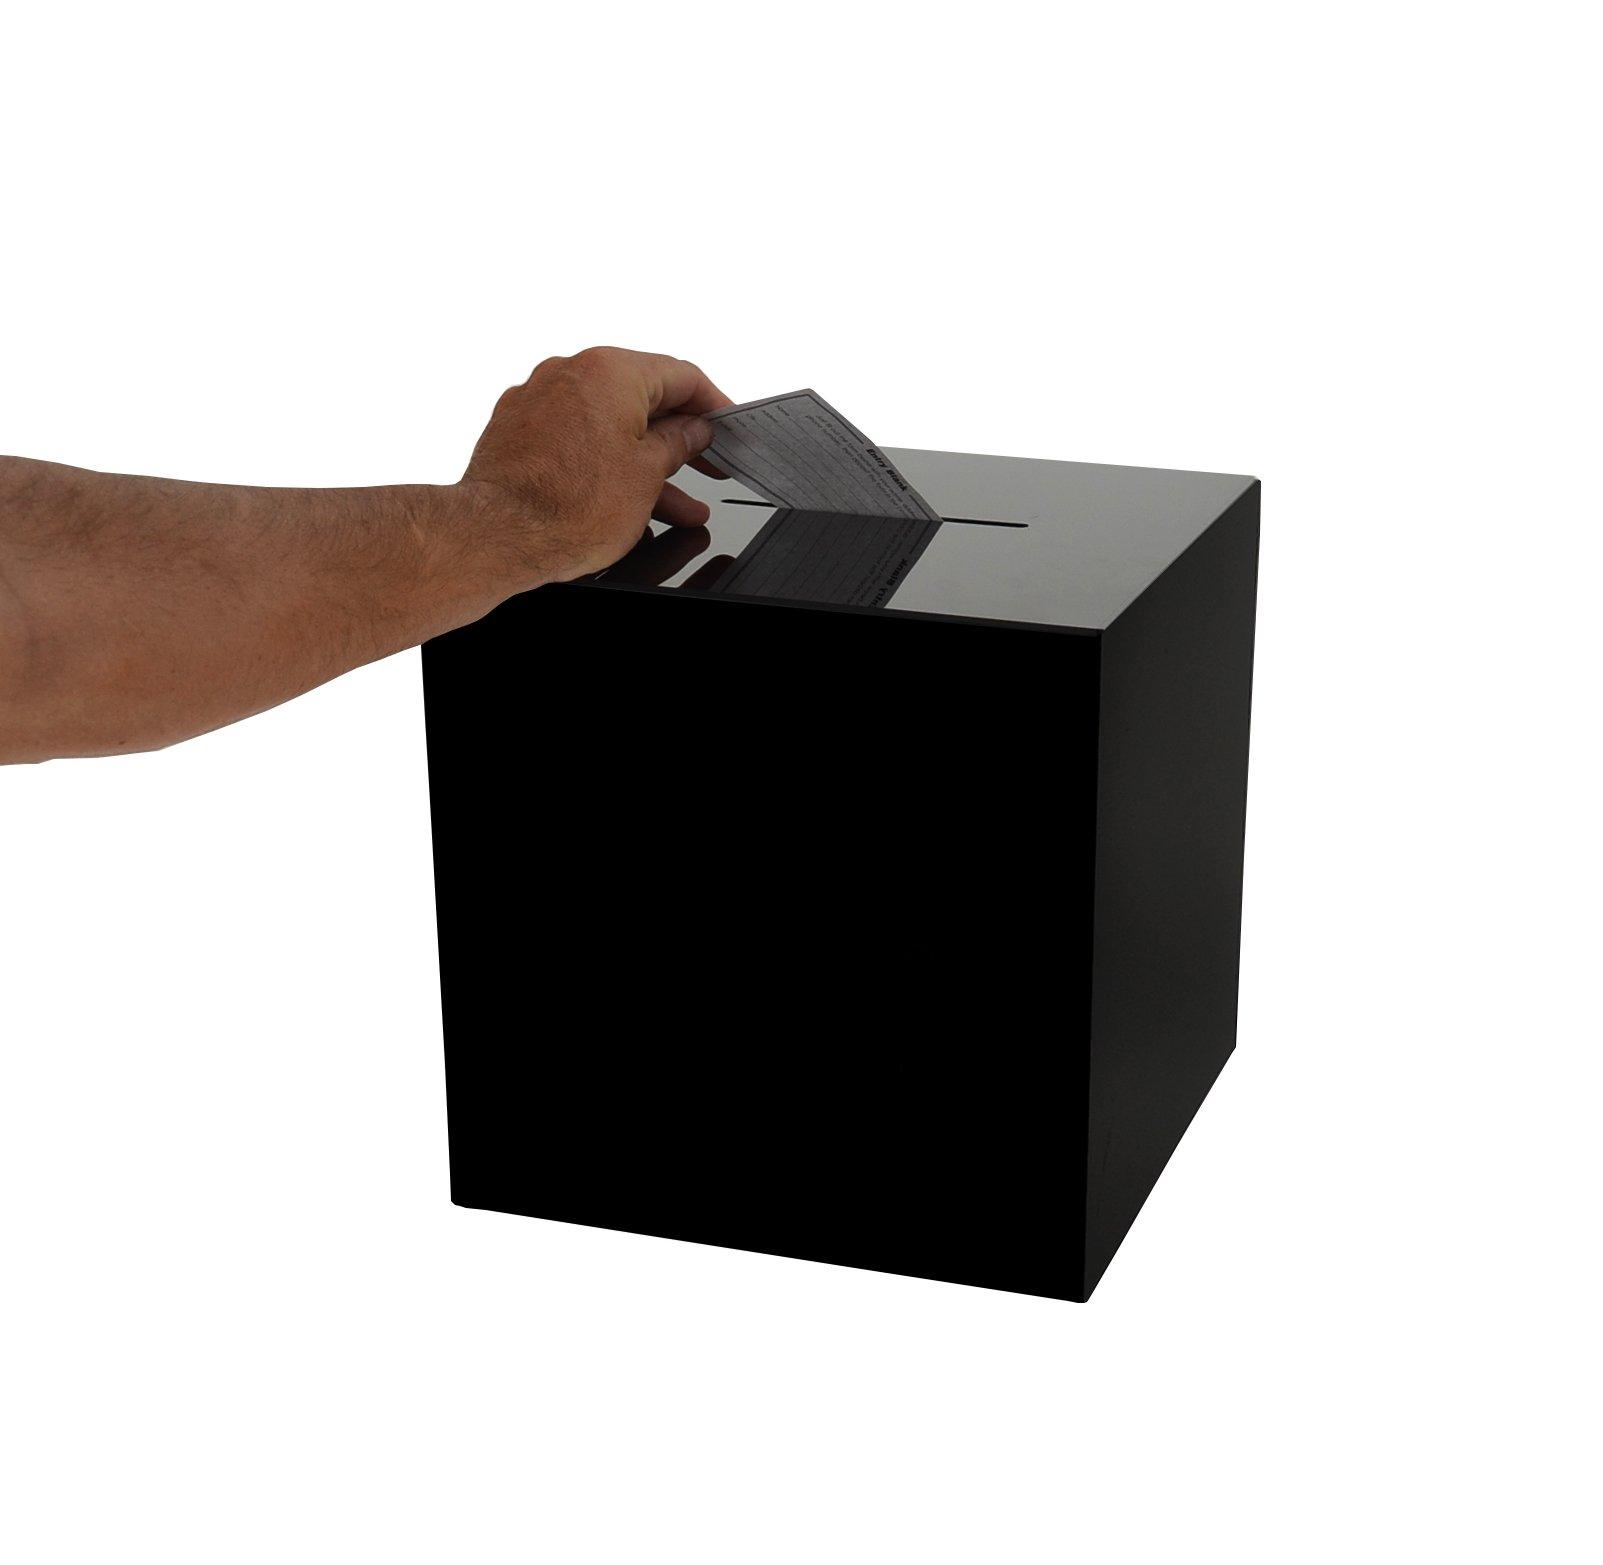 Marketing Holders Acrylic Locking Ballot/Suggestion Box 11 x 11 x 11 (Black)